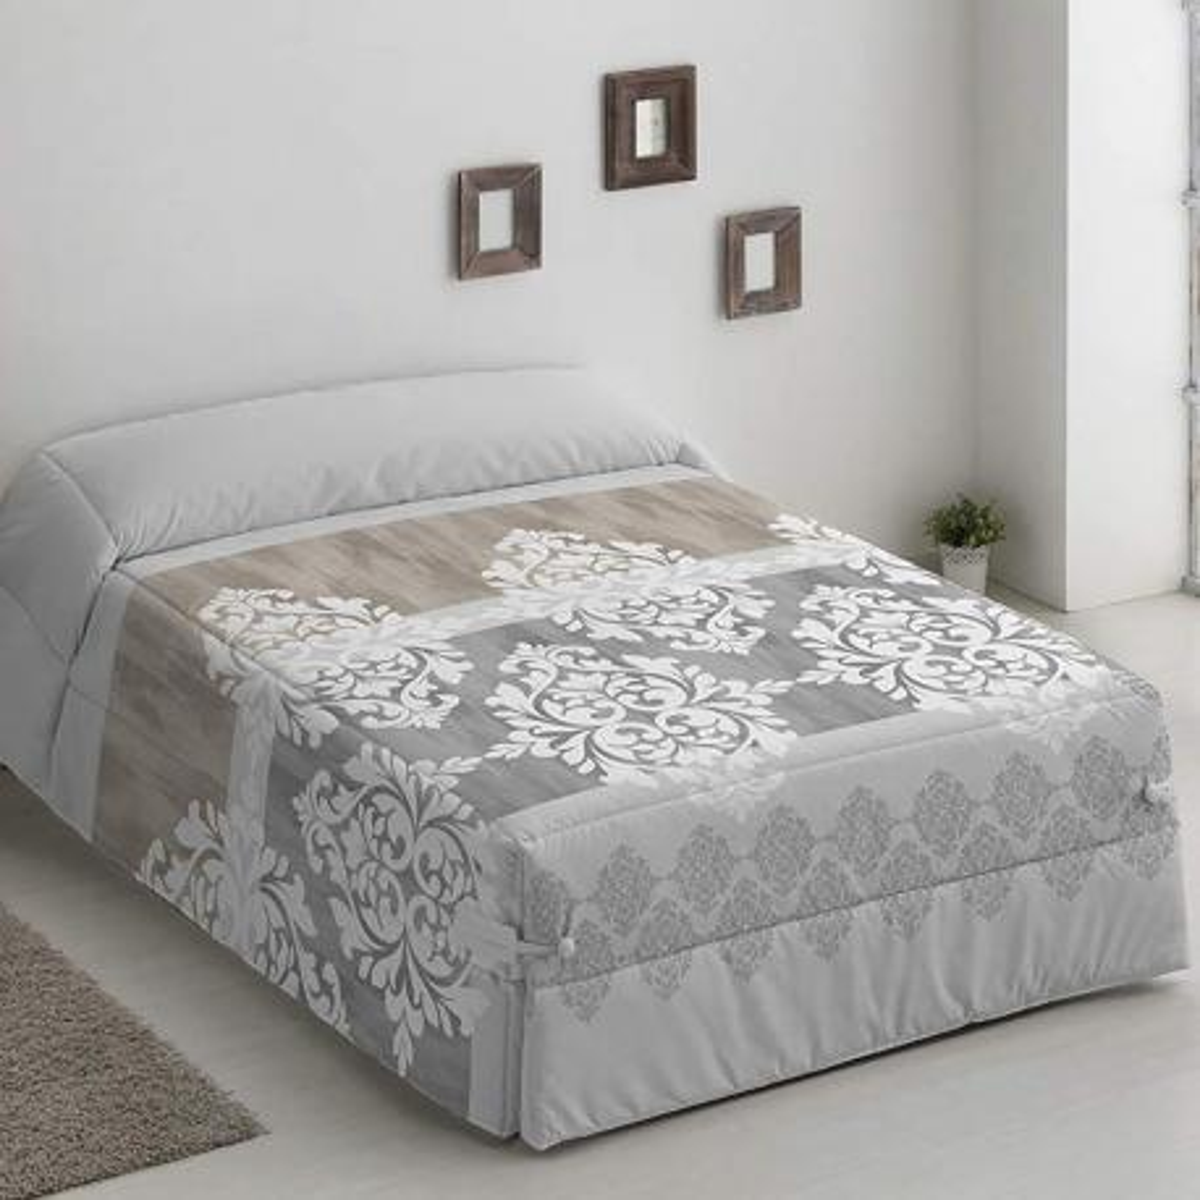 Conforter ALMA Camatex